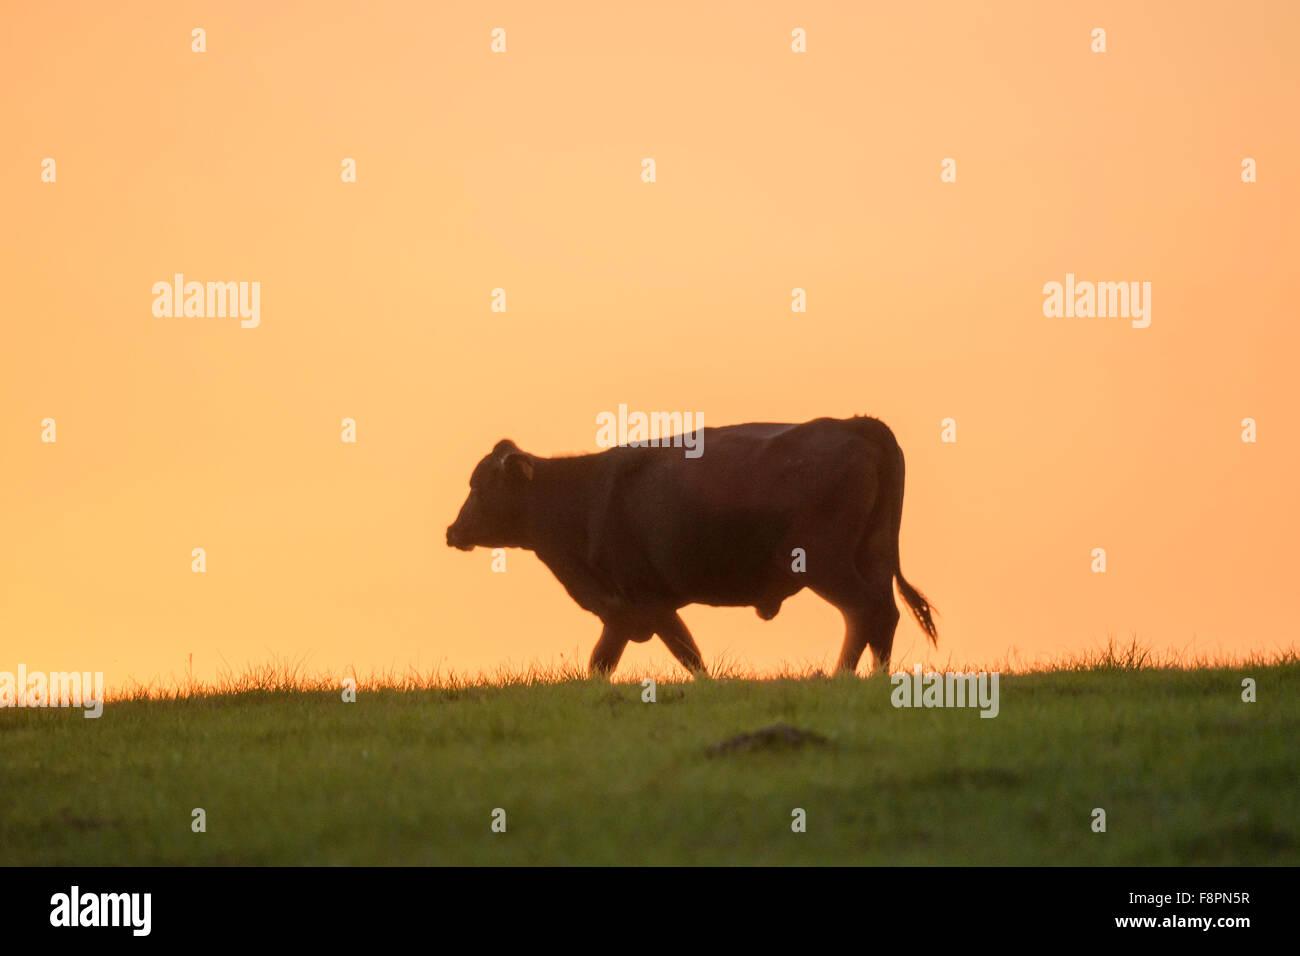 Angus-Rinder gegen Horizont bei Sonnenuntergang Stockbild